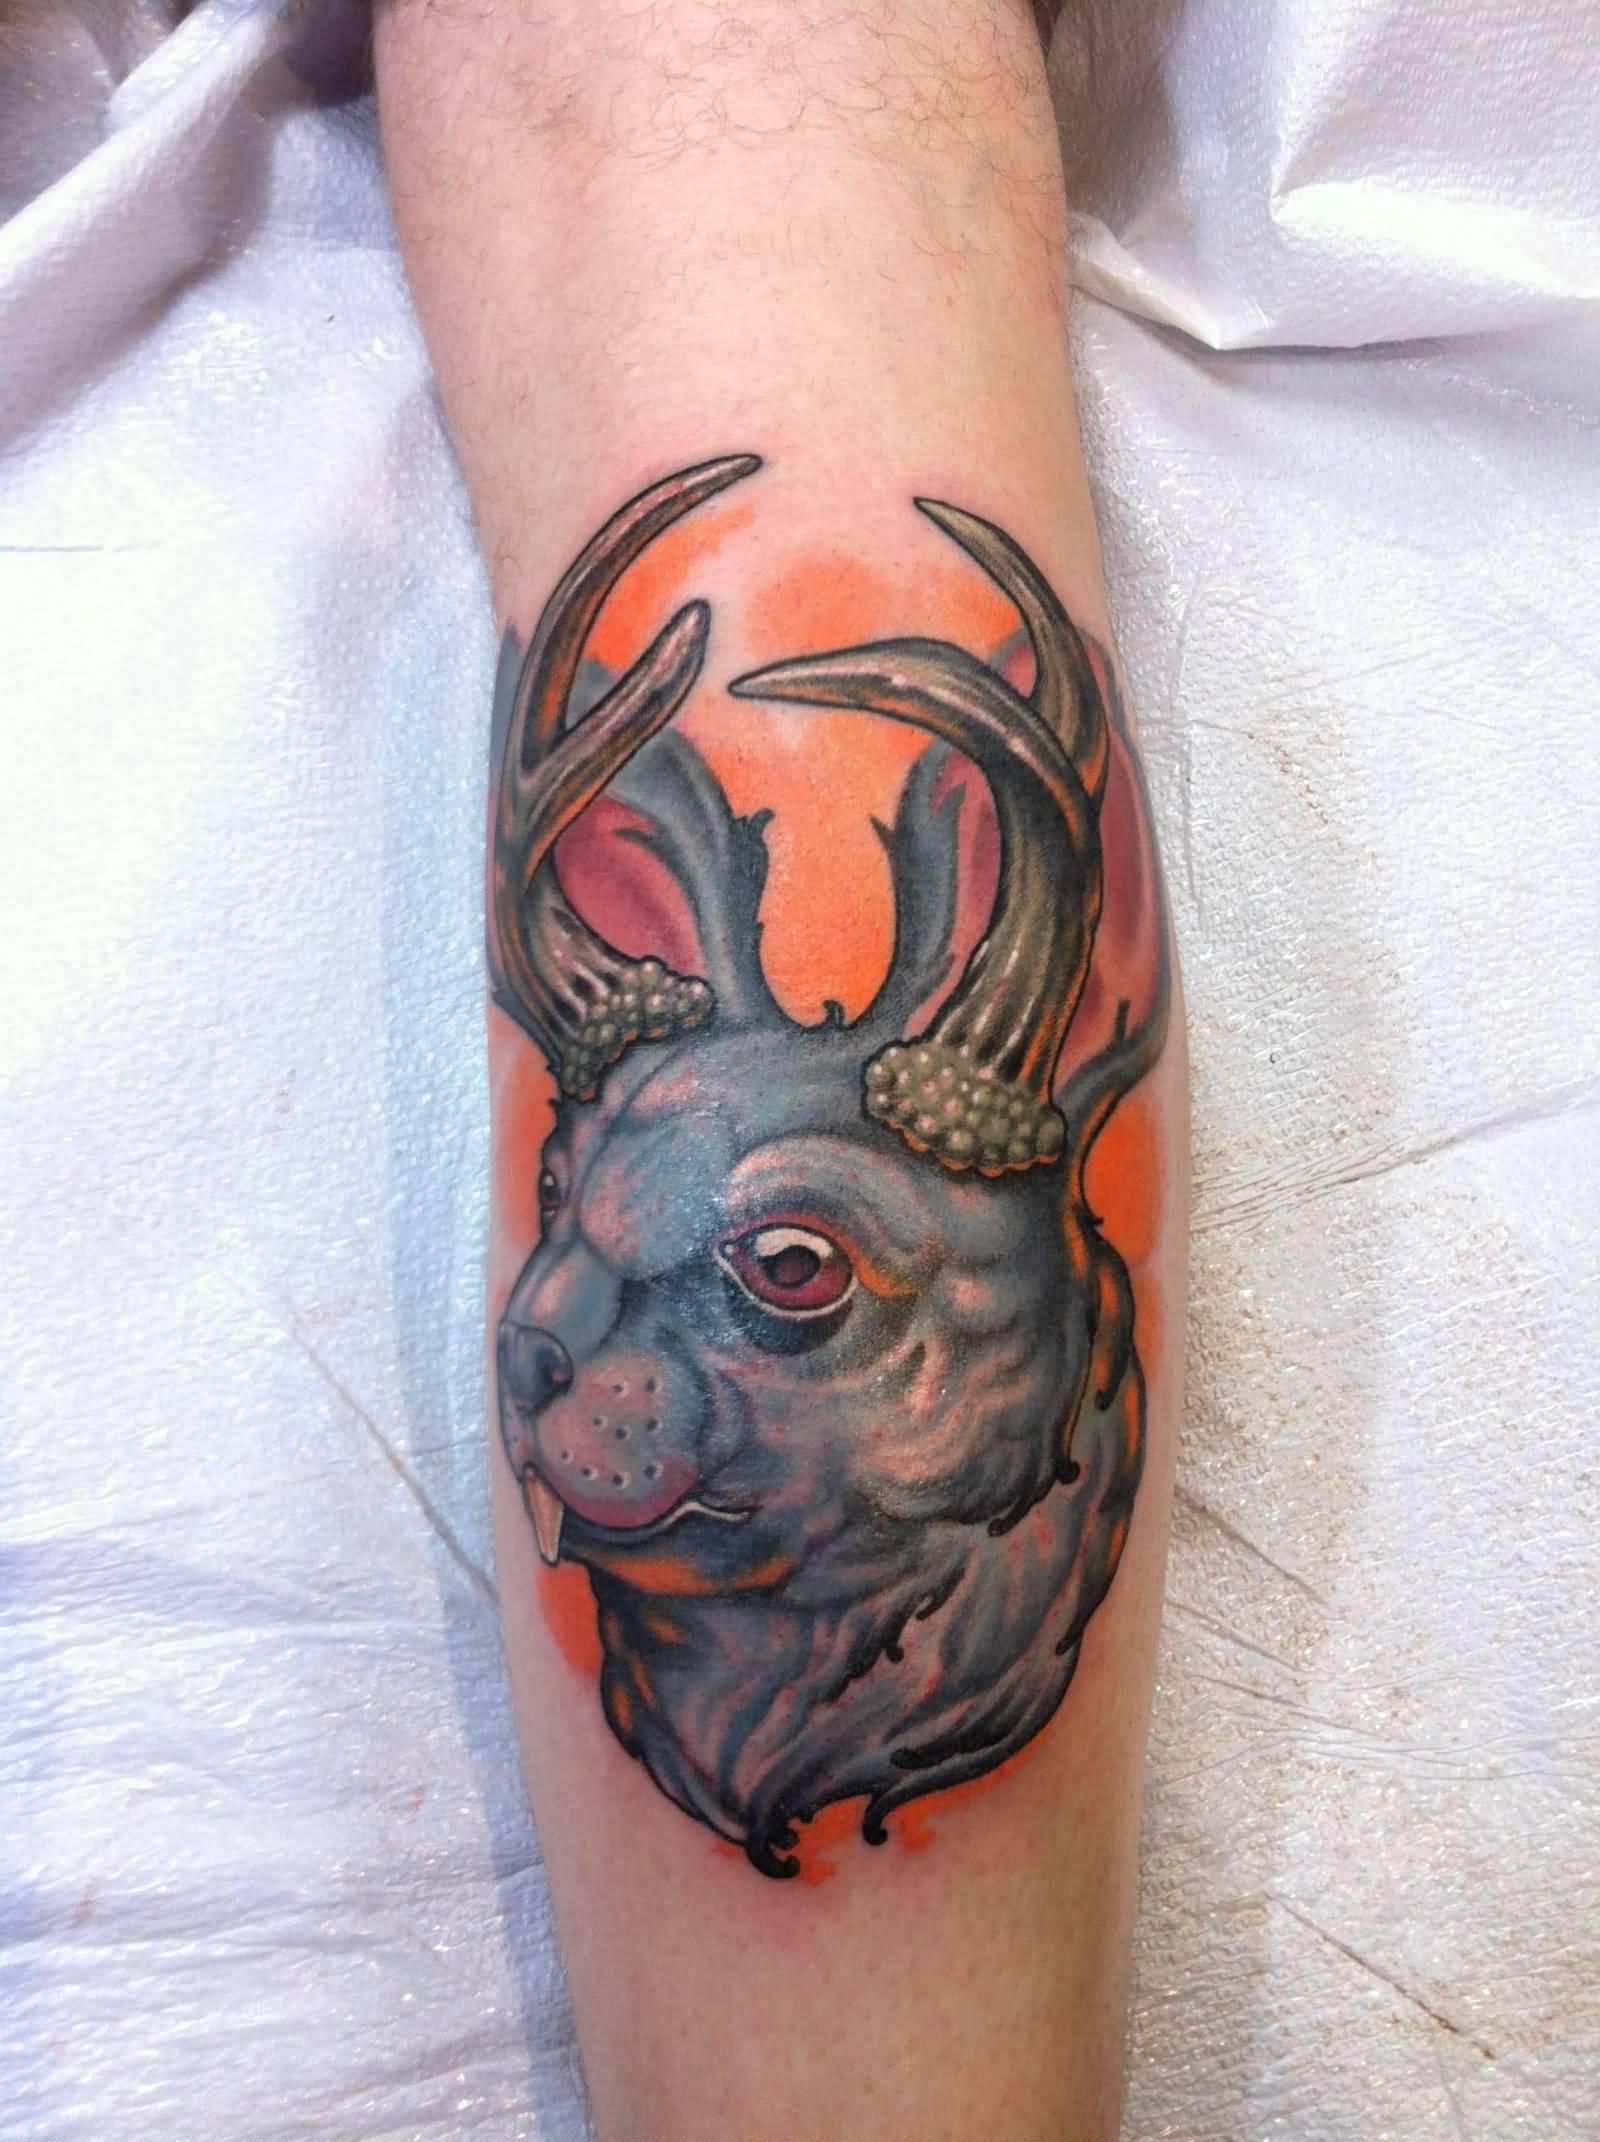 Jackalope Tattoo Meaning : jackalope, tattoo, meaning, Jackalope, Tattoo